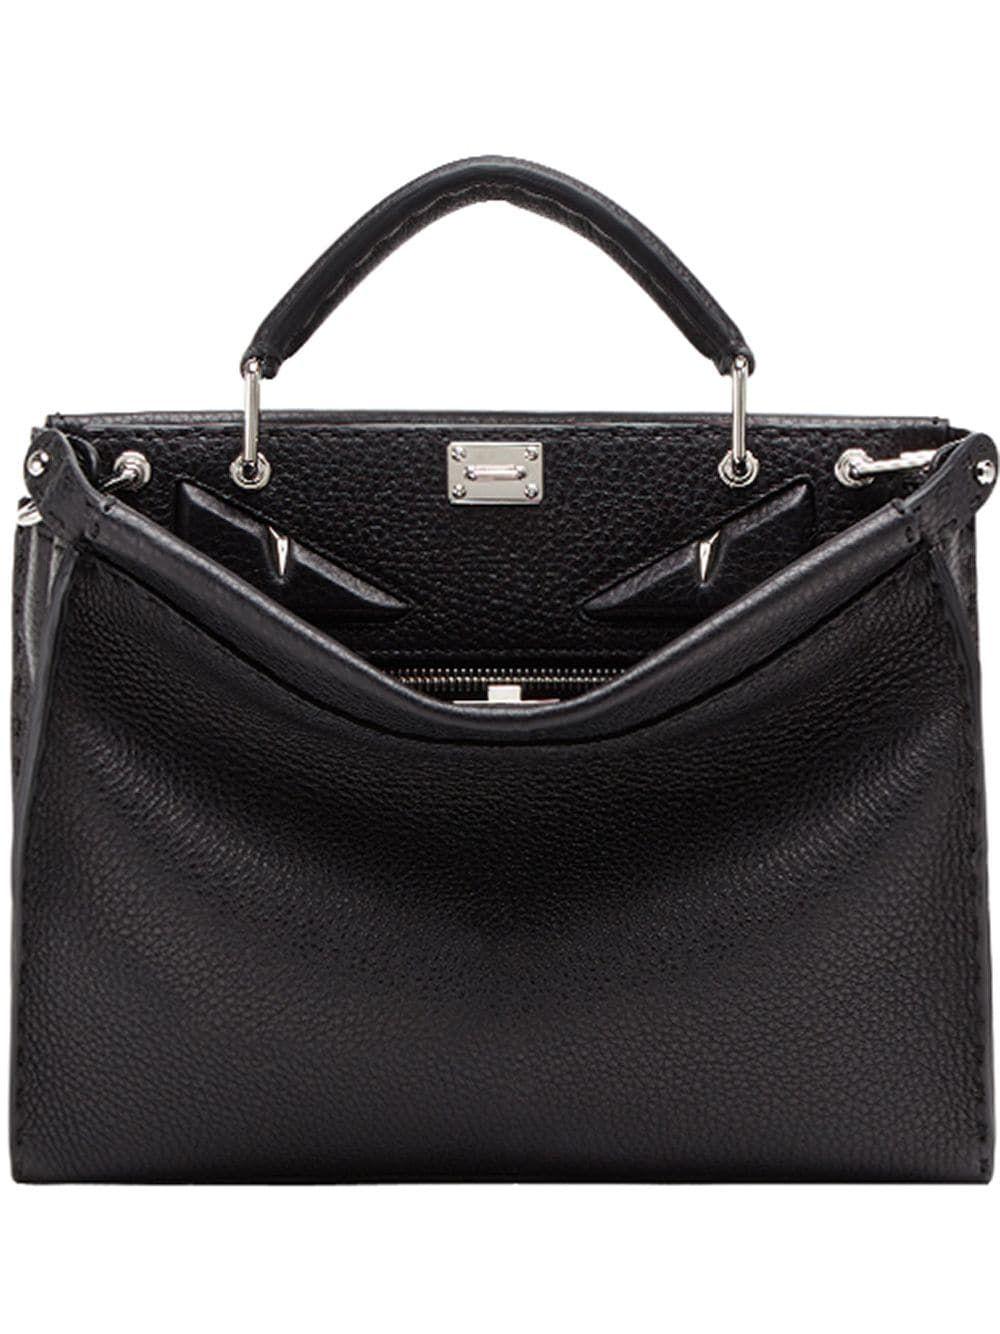 389333a5194f FENDI FENDI MINI PEEKABOO FIT BAG - BLACK.  fendi  bags  shoulder bags   hand bags  leather  keychain  accessories